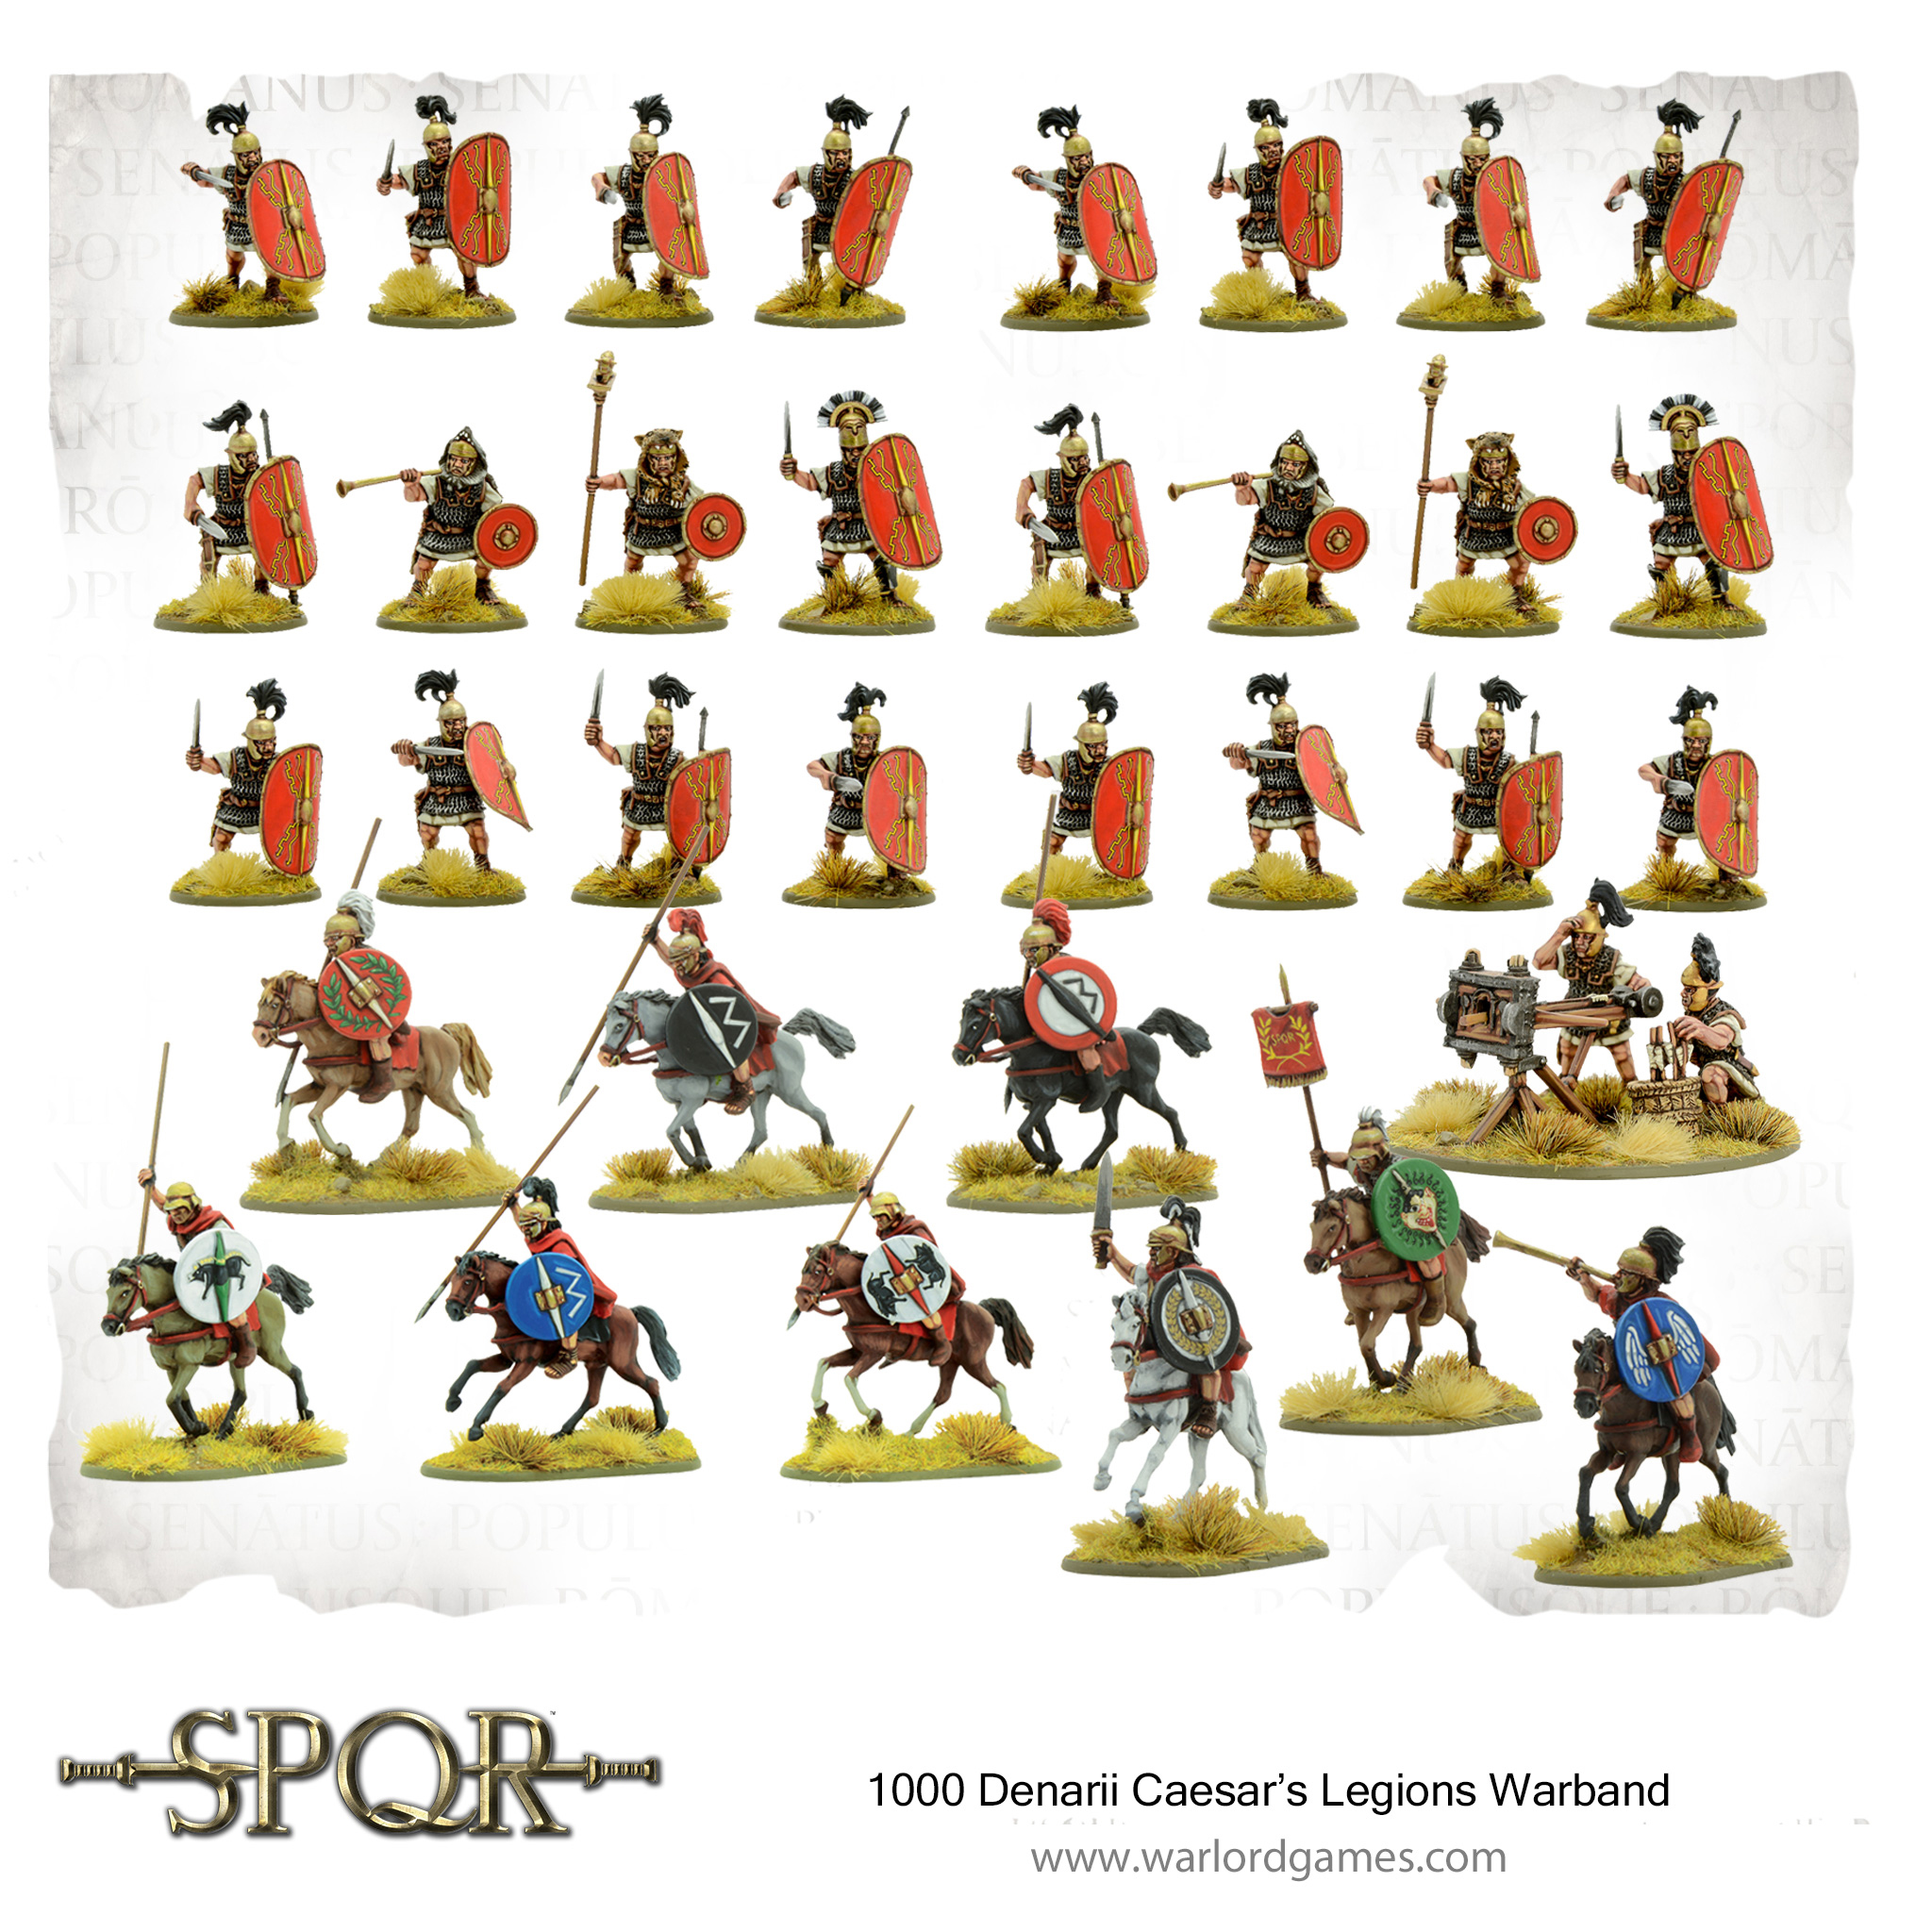 1000 Denarii Caesar's Legion Warband